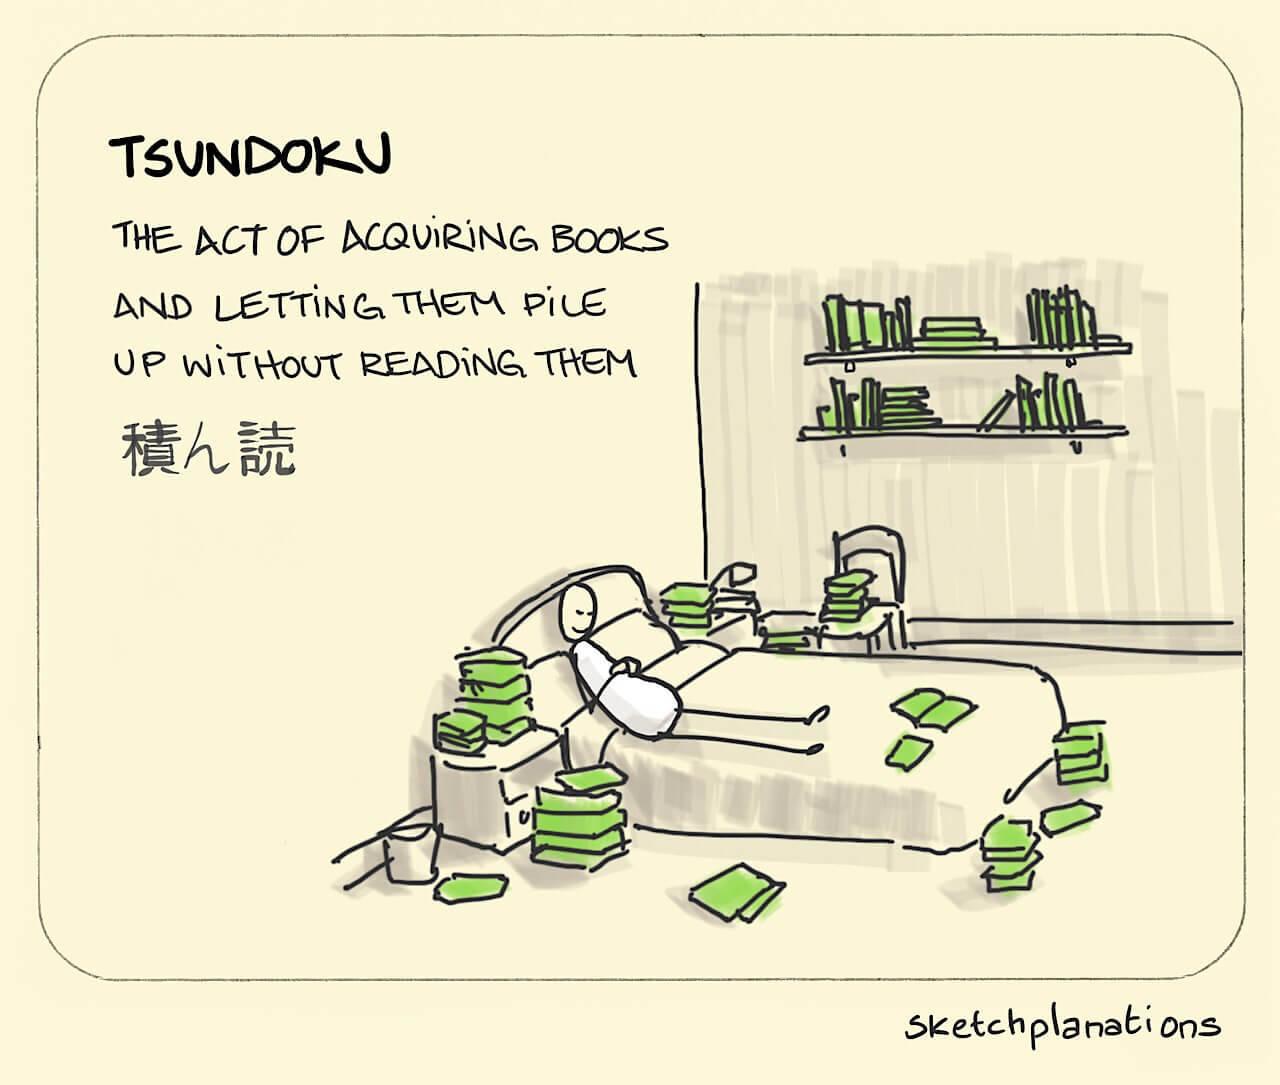 tsundoku_the_habit_of_piling_books_without_reading.jpg